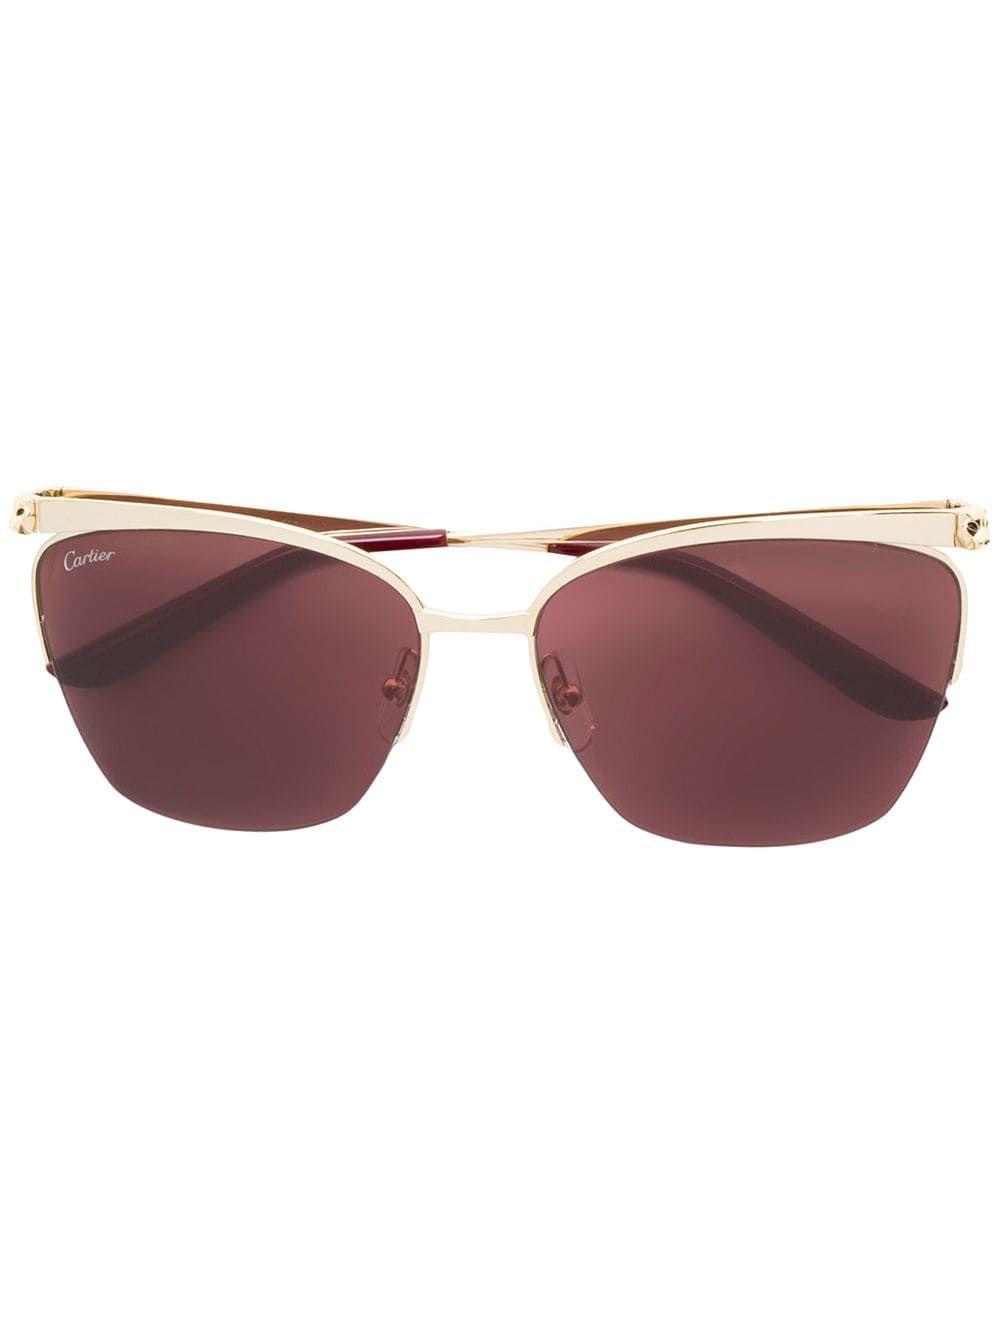 bf506ea0c0 Cartier panthÈre de cartier sunglasses gold cartier jpg 1000x1334 Cartier  frame gold 2018